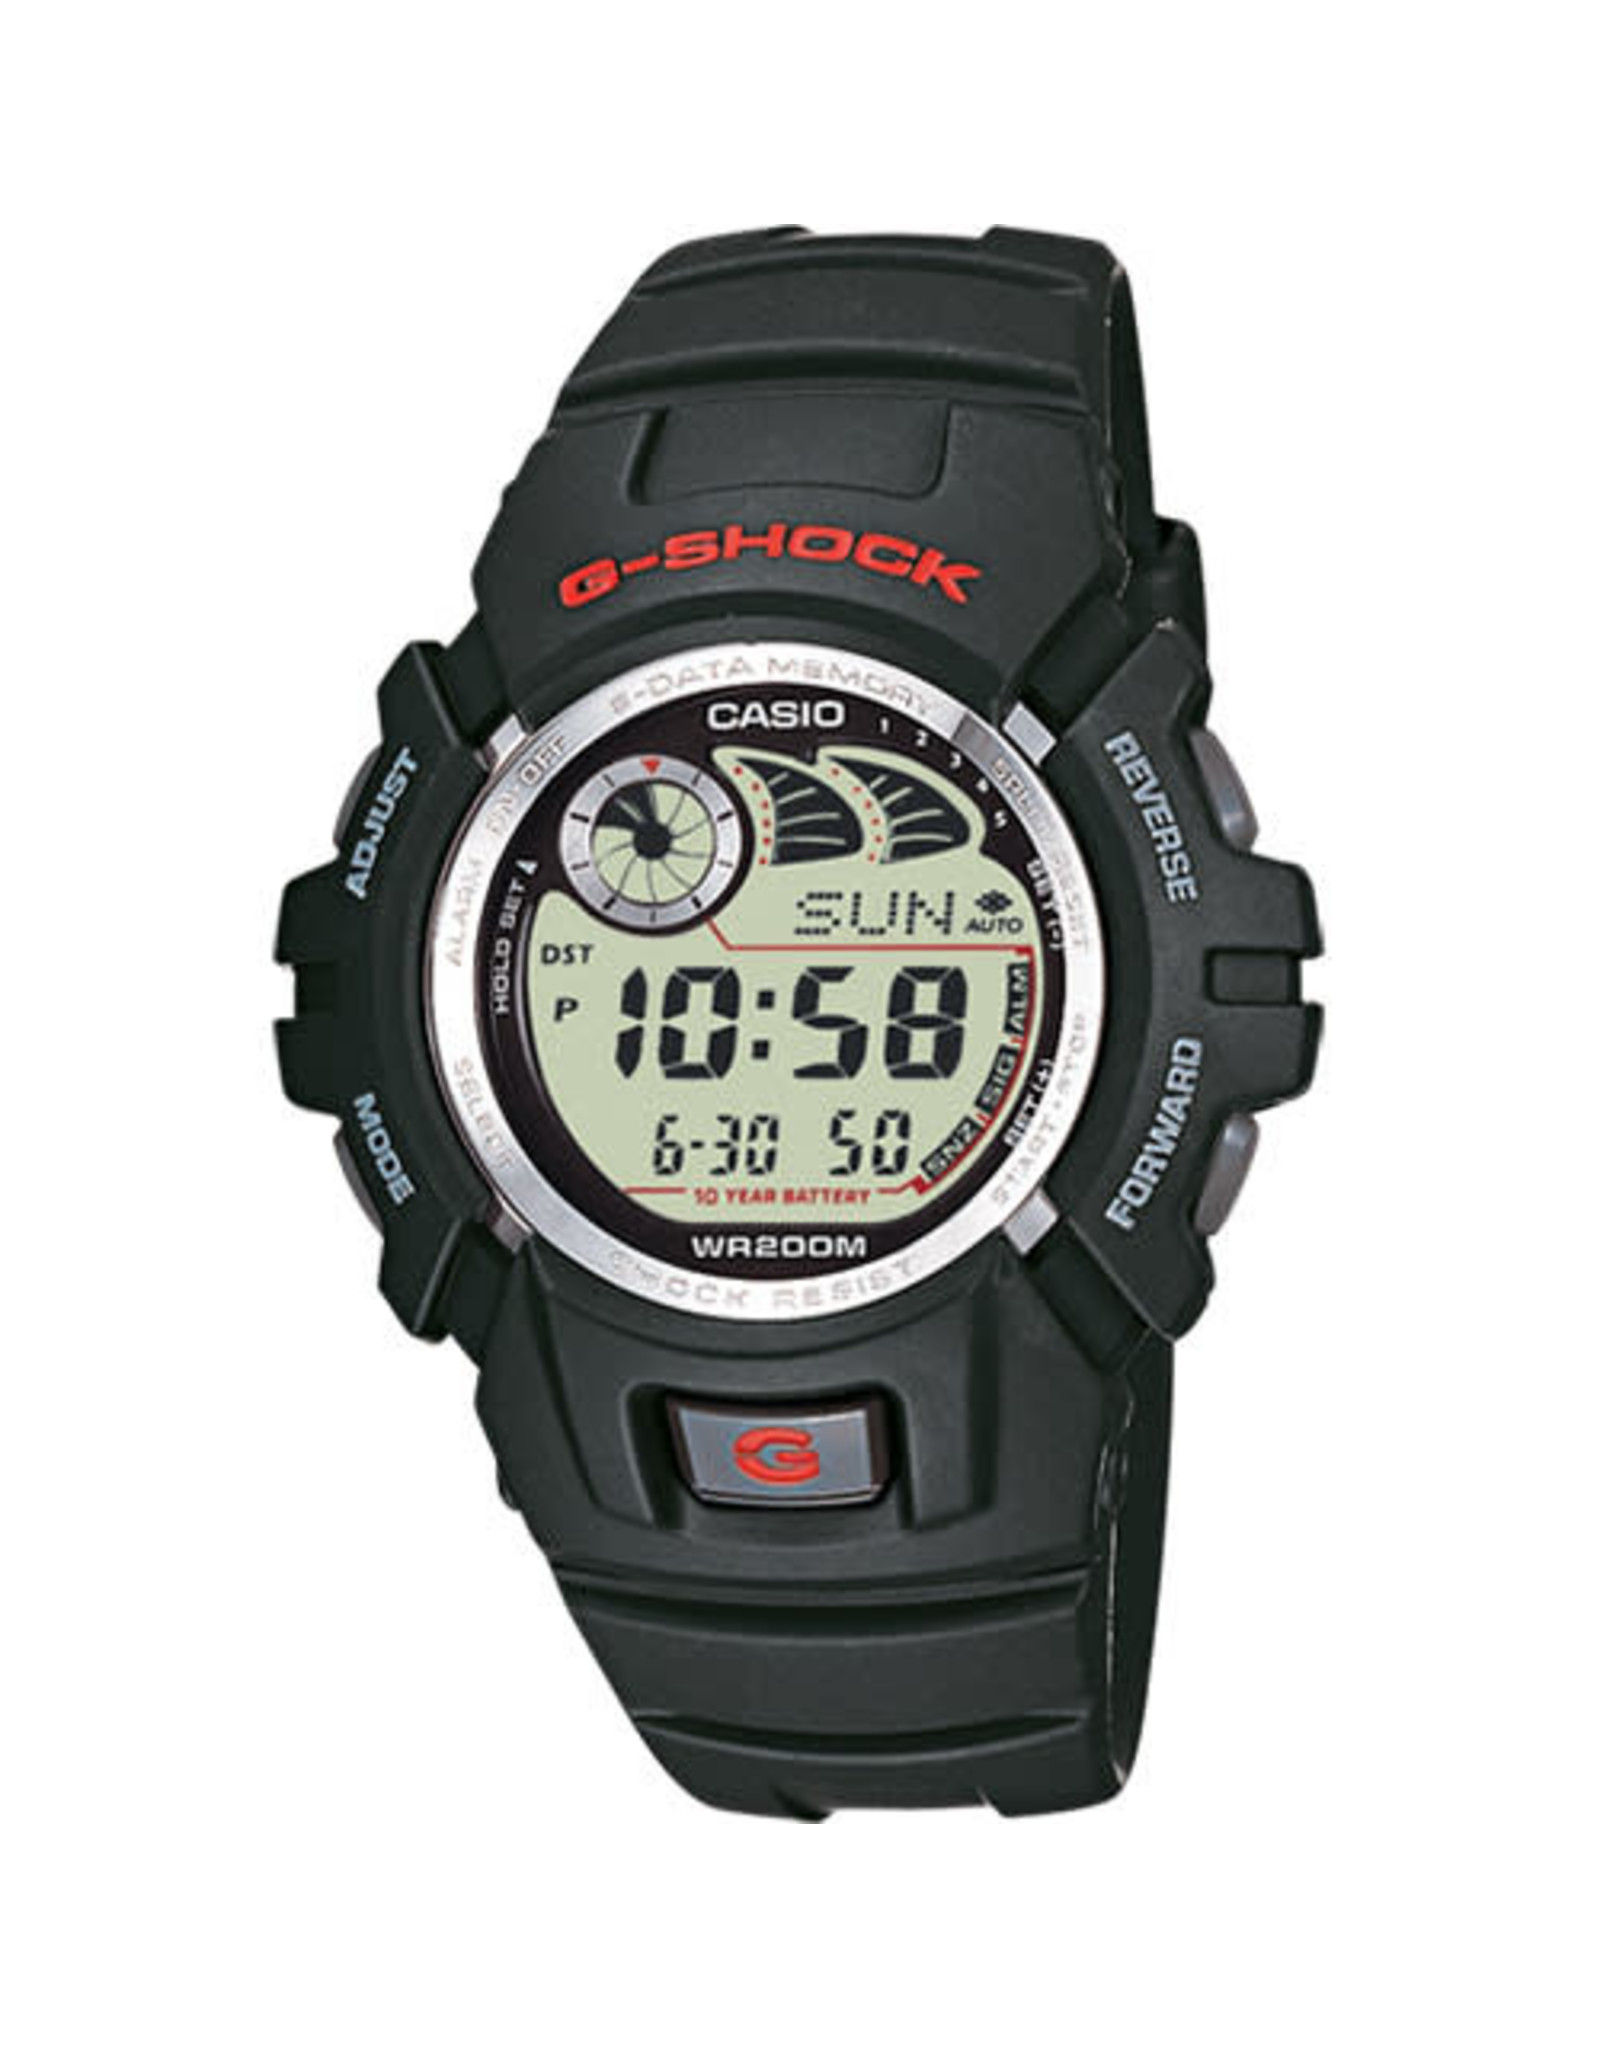 Casio Casio G-Shock G-2900F-1VER